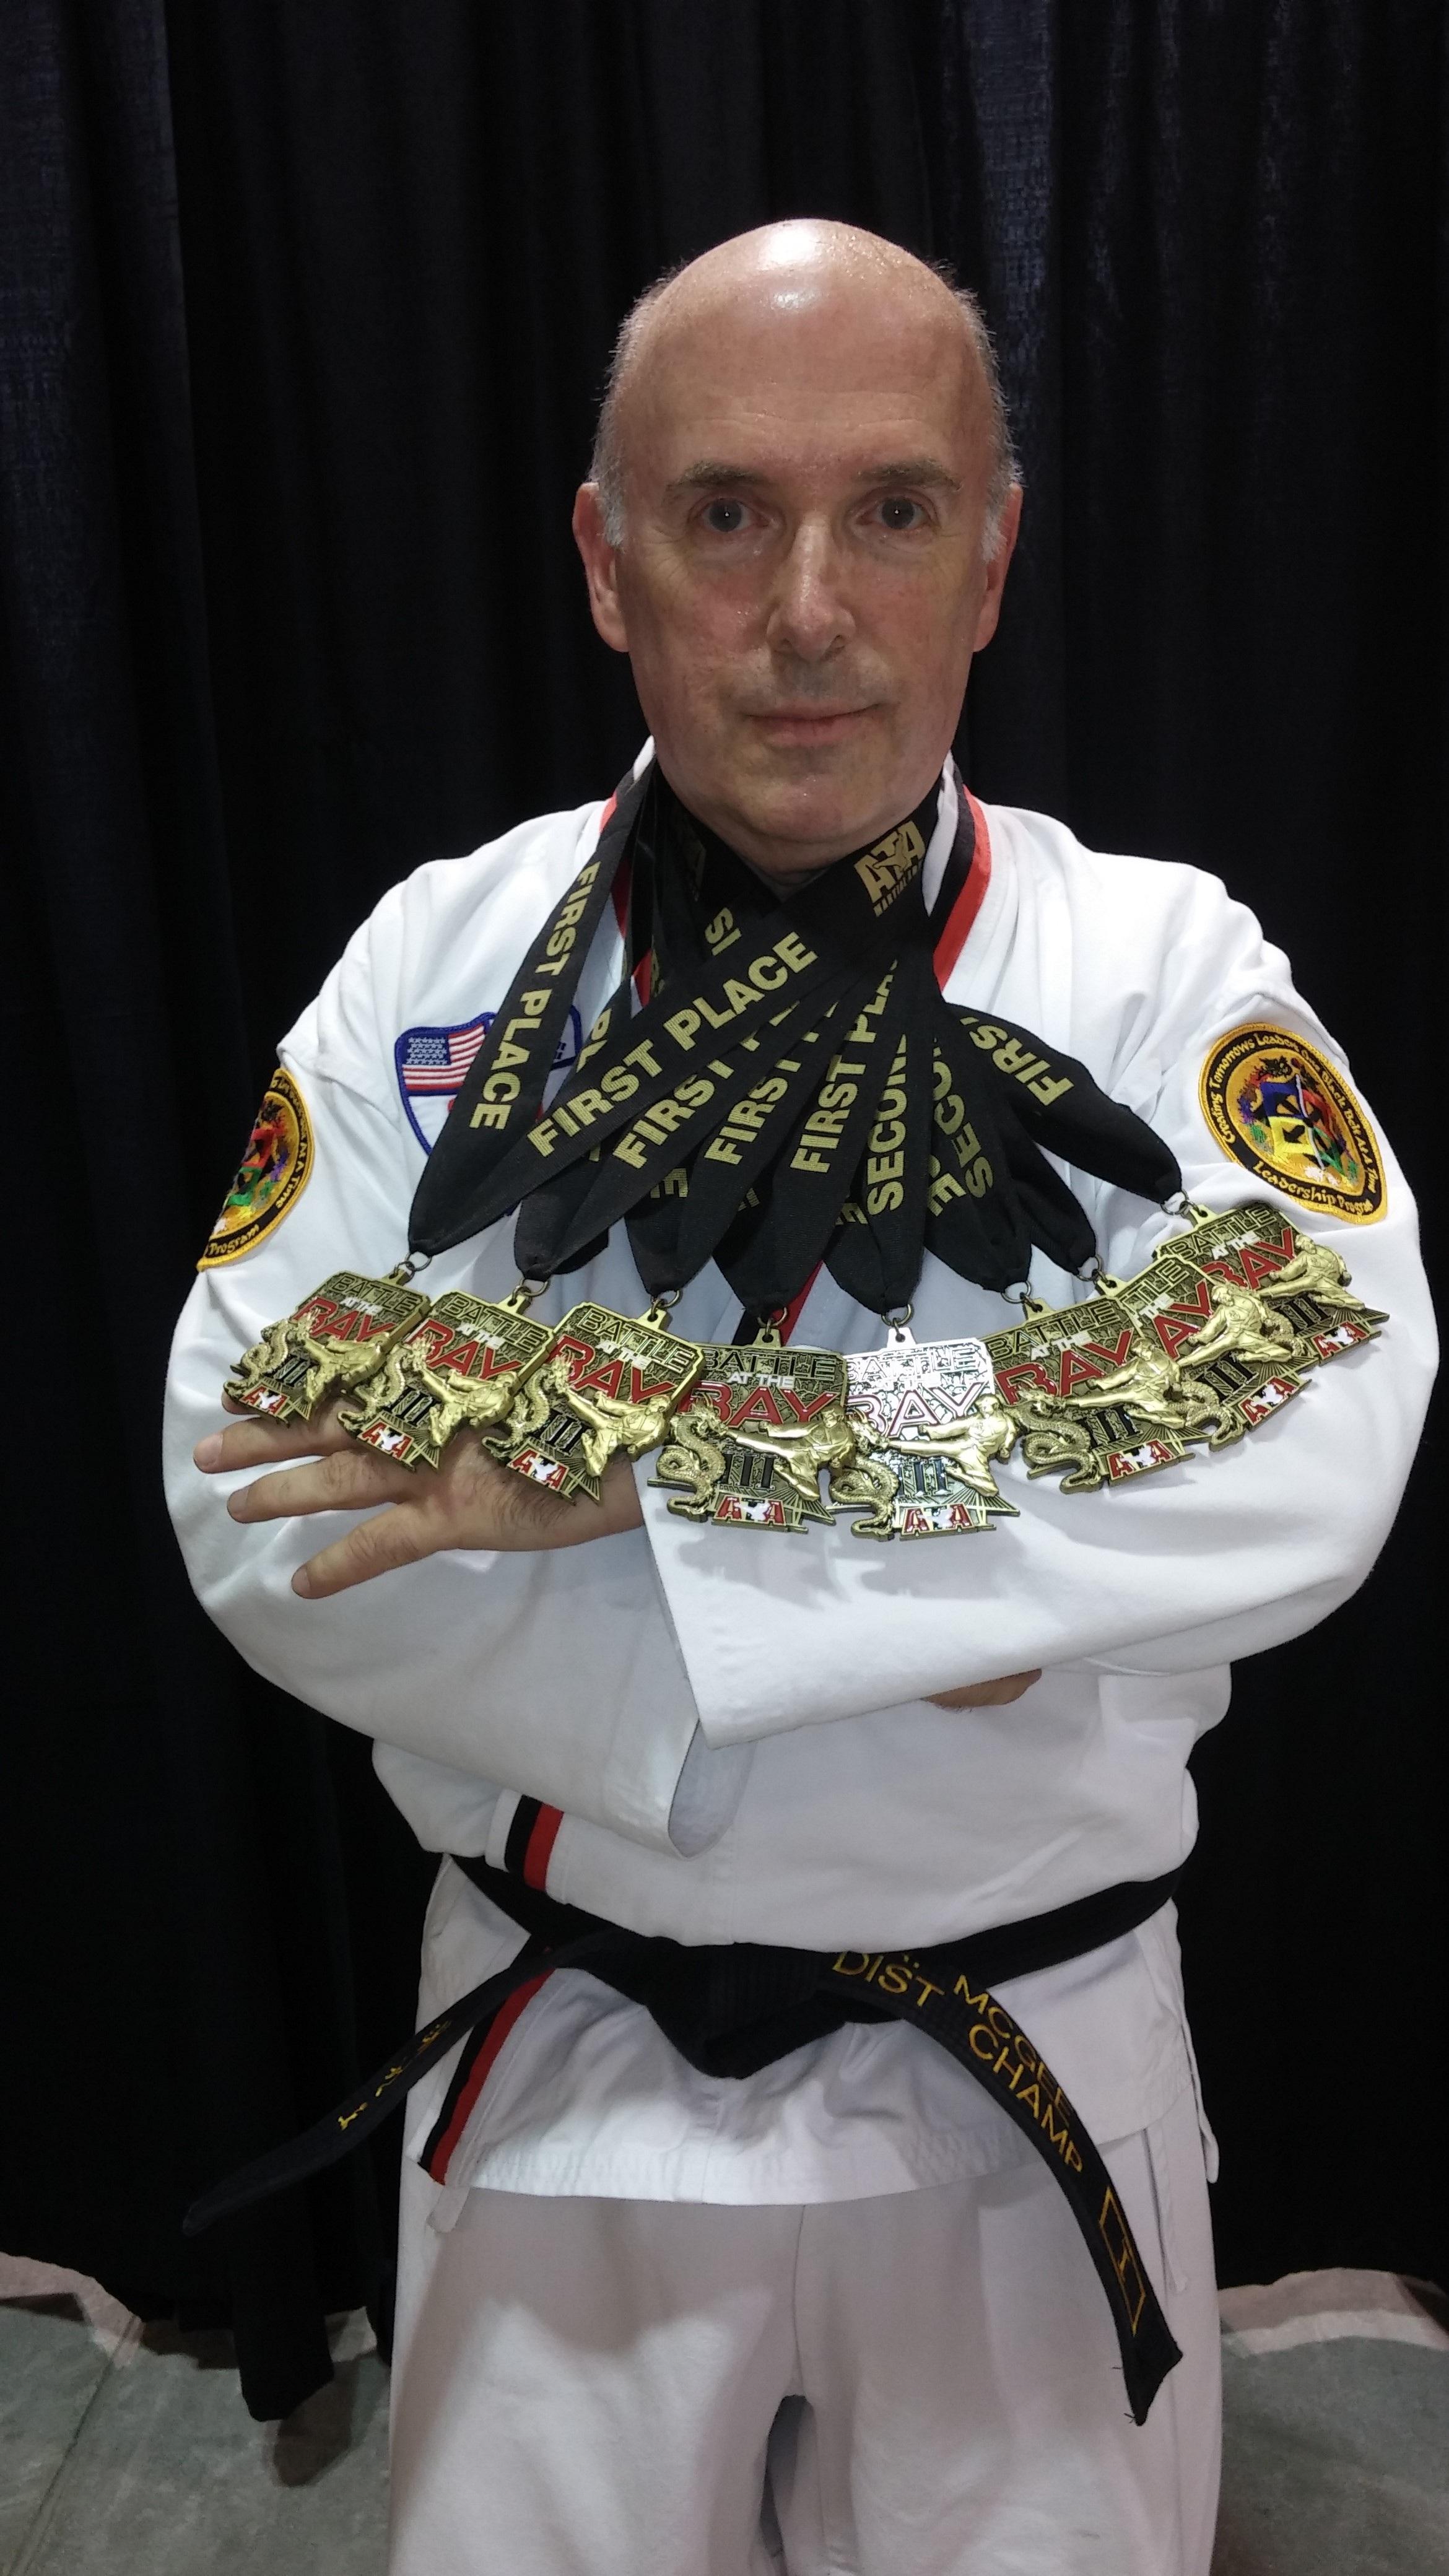 valkoinen vaatetus musta vyö Urheilu puku martial karate taekwondo musta vyö ab6780f8d9